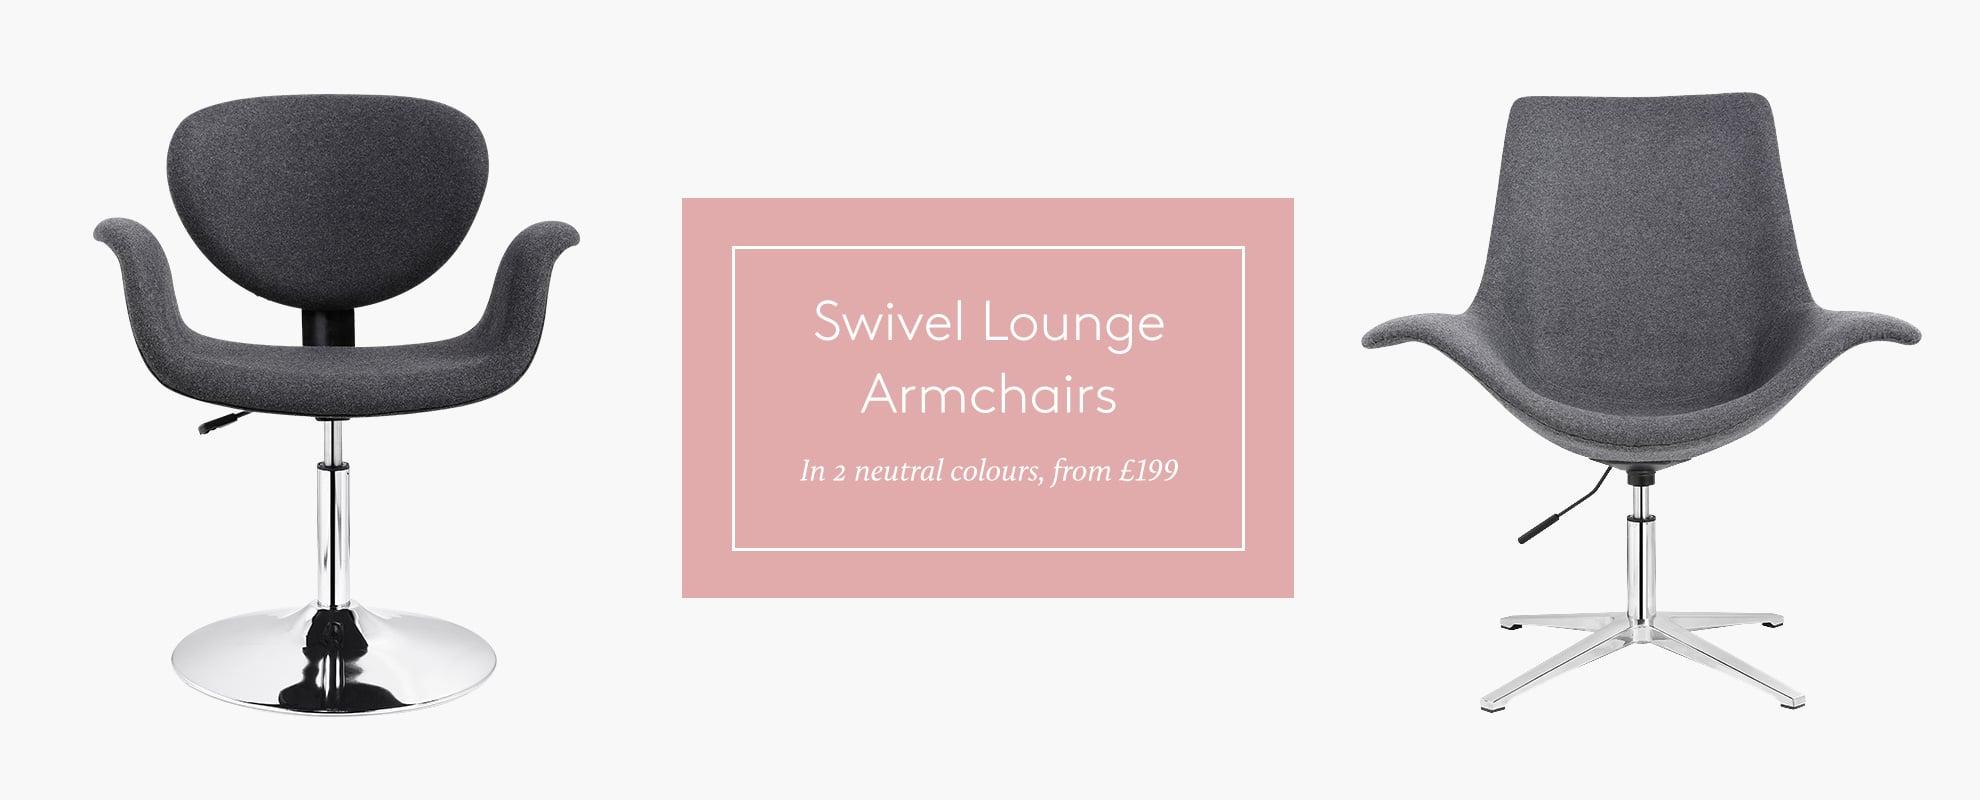 Swivel Lounge Armchairs